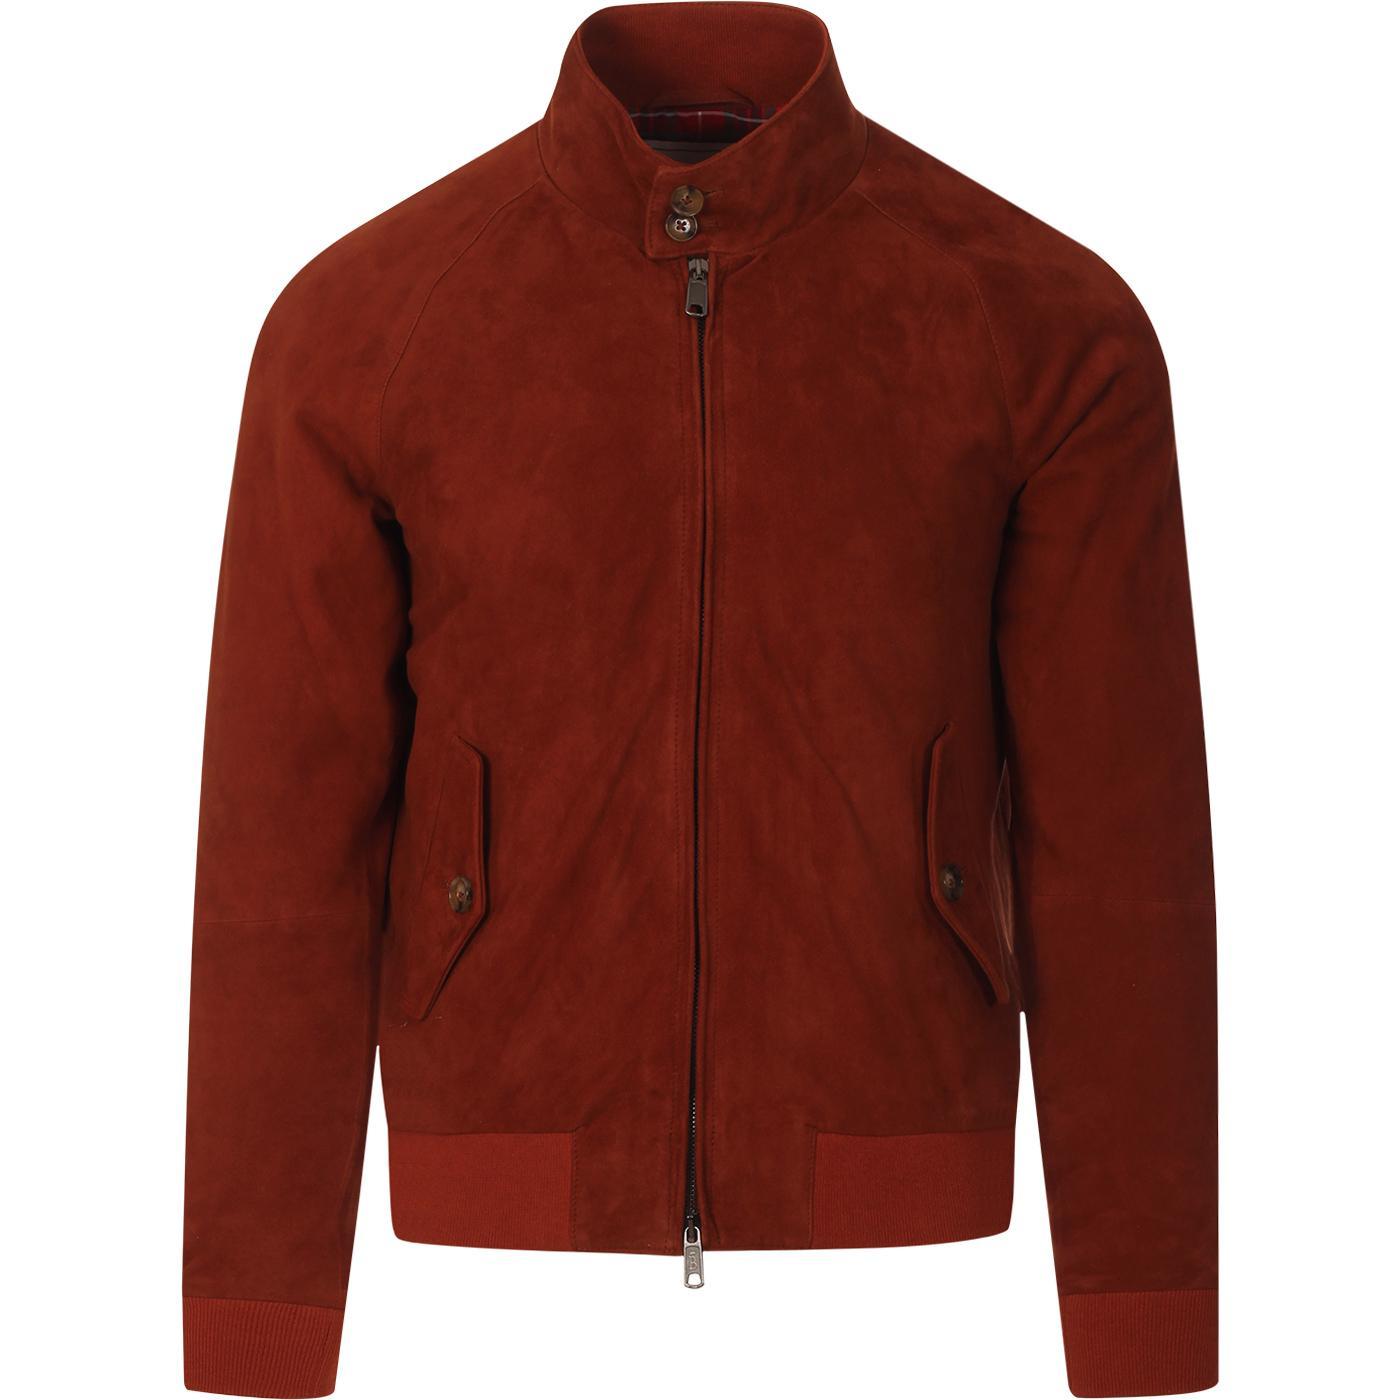 BARACUTA G9 Suede Retro Harrington Jacket (Rust)